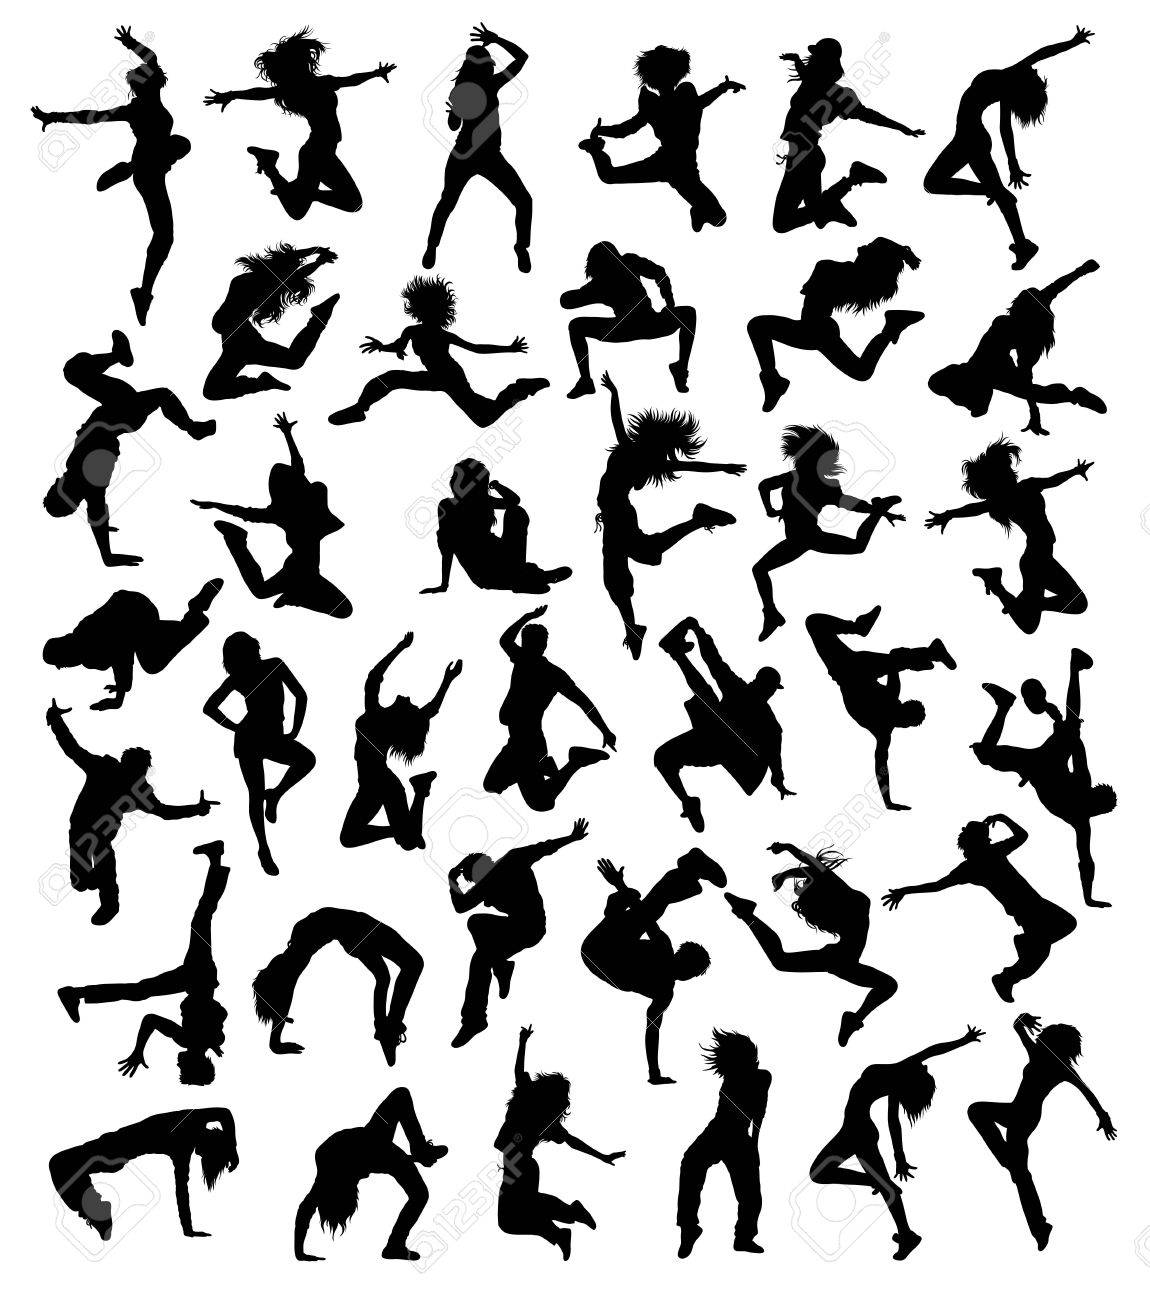 Hip Hop Dancing Collection, illustration art vector design - 66596687